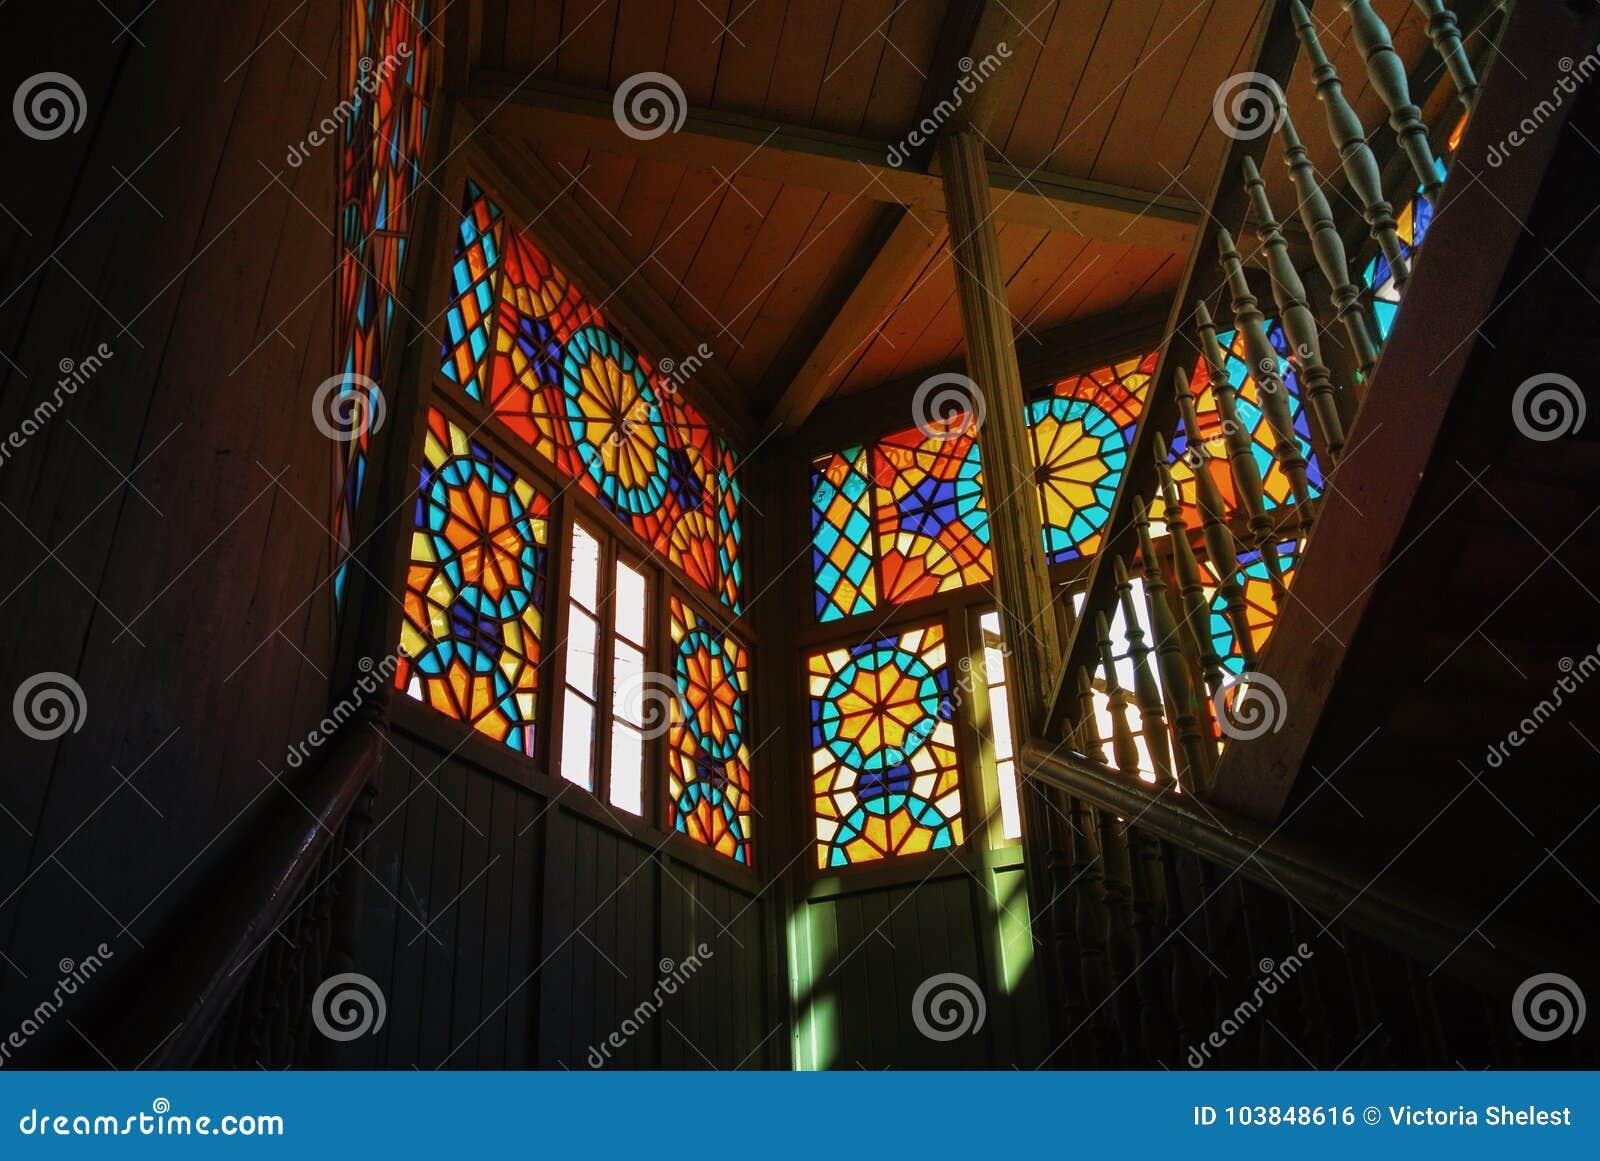 Tbilisi Georgia January 3 2016 Old Wooden Decorated Interio